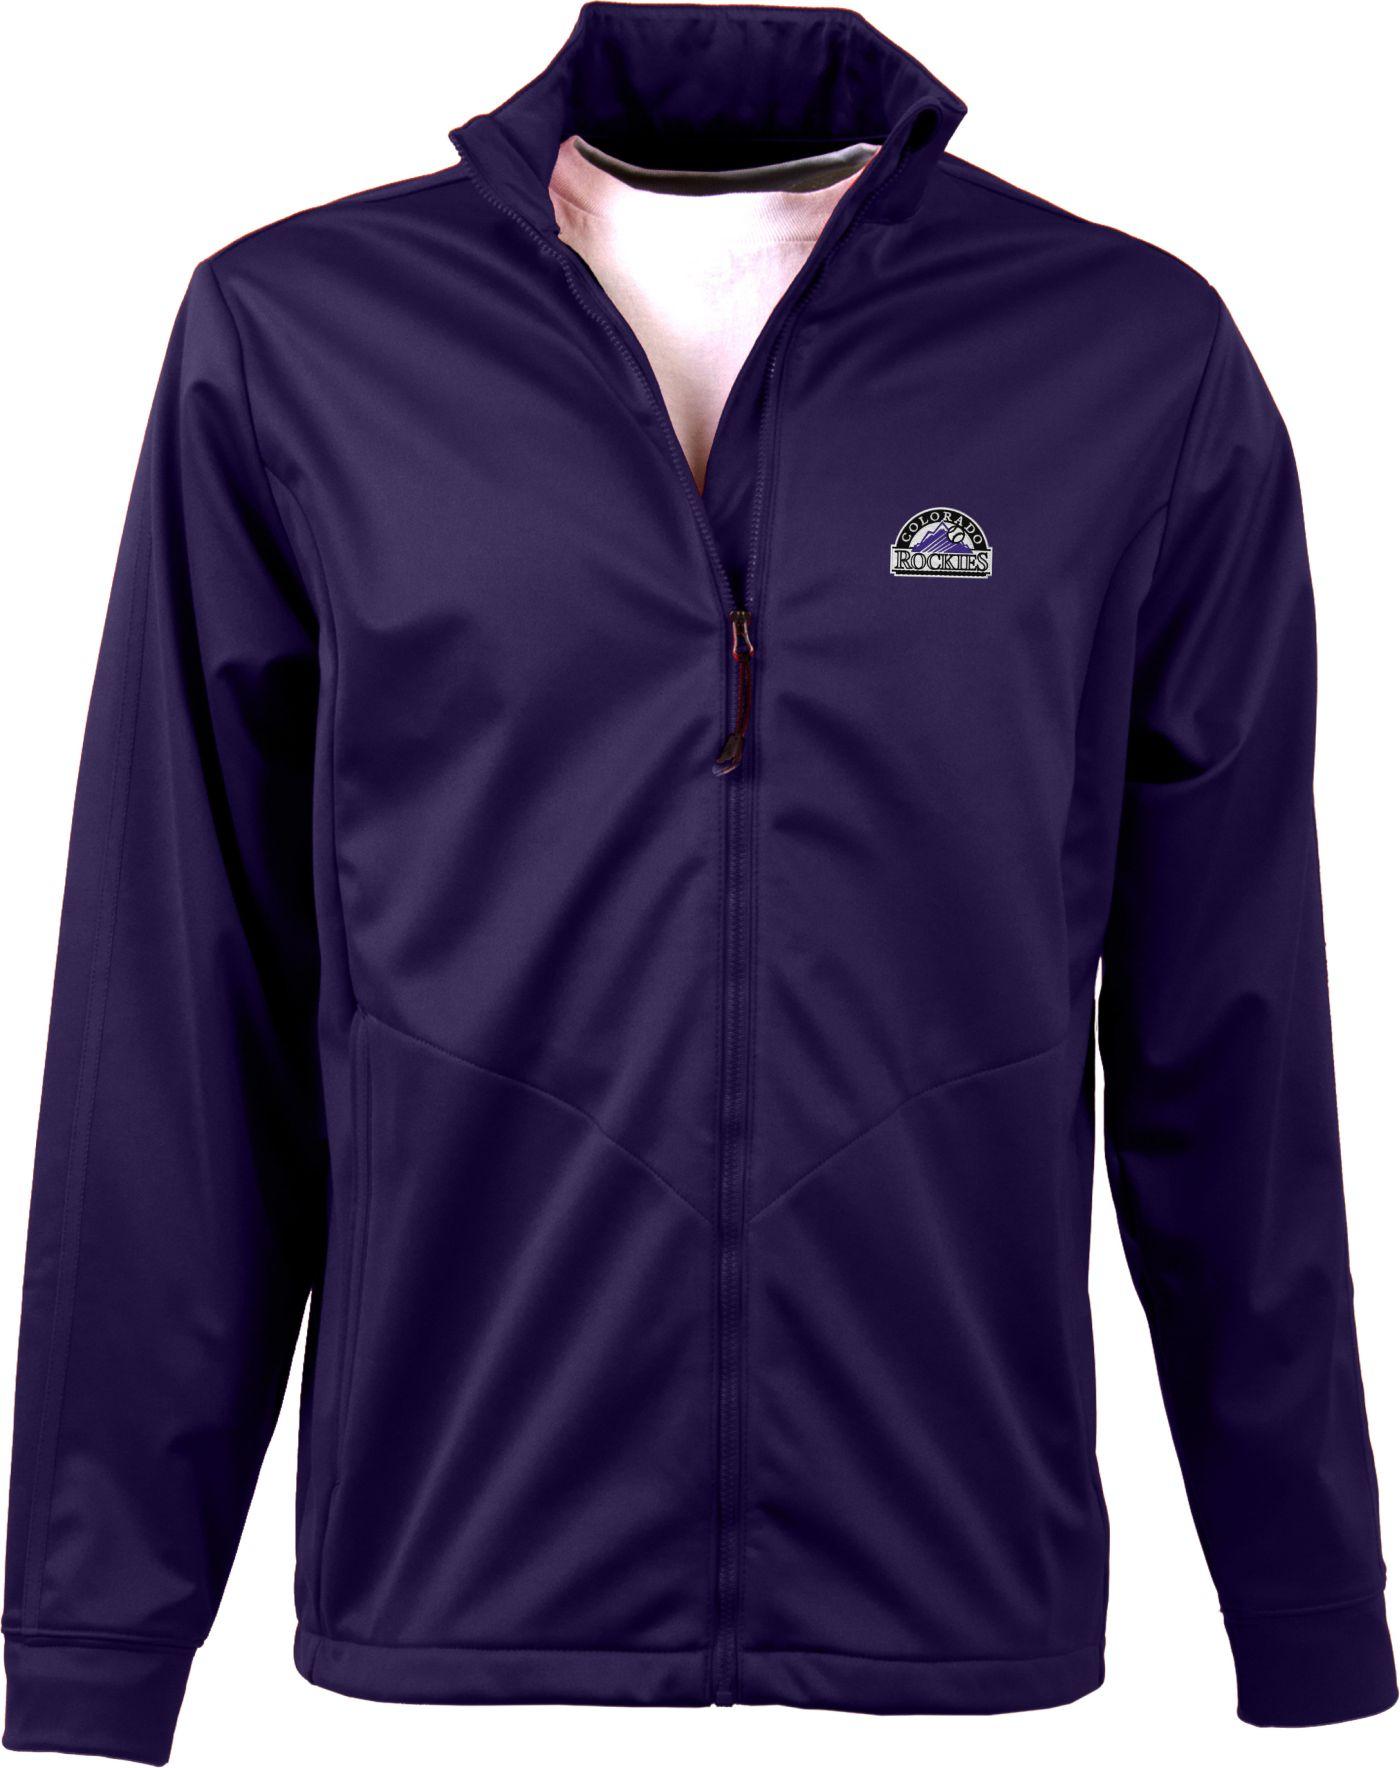 Antigua Men's Colorado Rockies Full-Zip Purple Golf Jacket